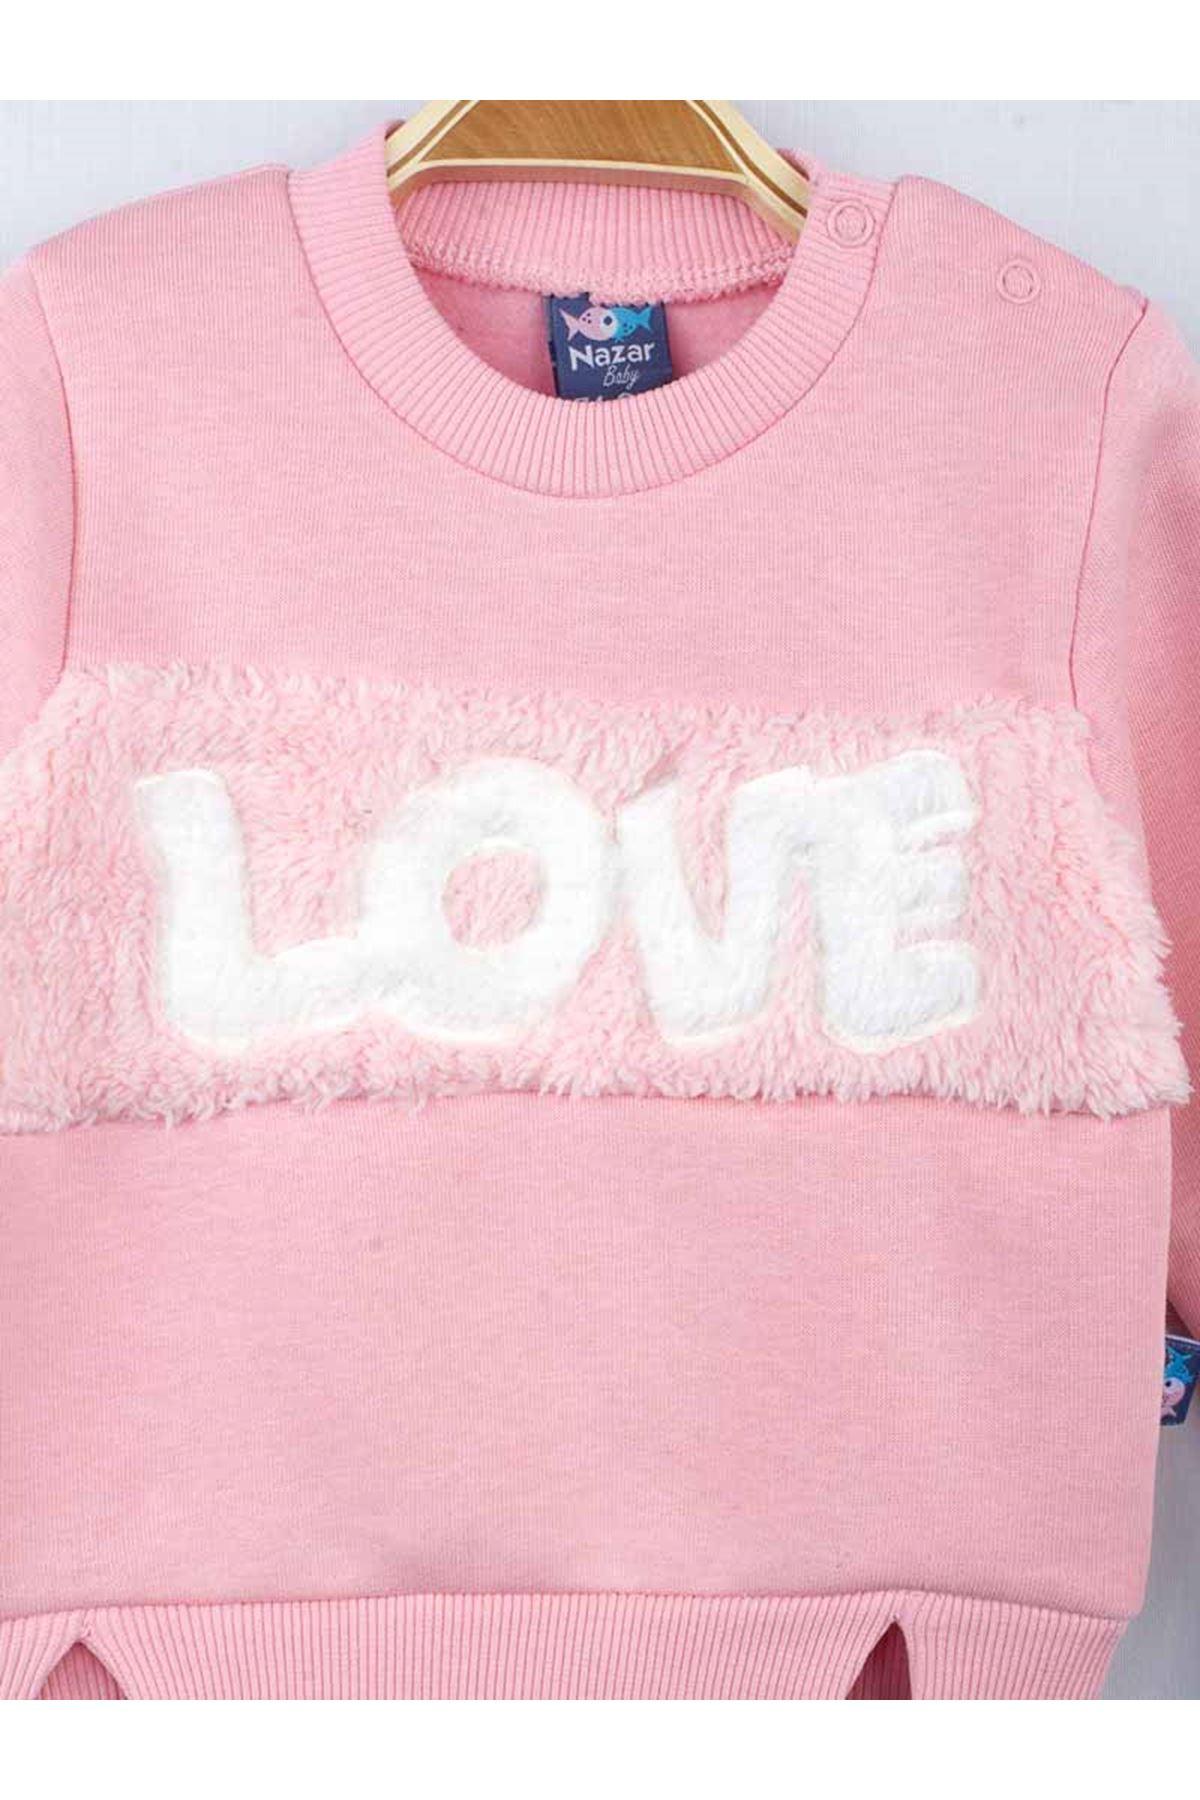 Pink navy blue girls baby 2 piece set bottom tracksuit top sweat love patterned seasonal suit models